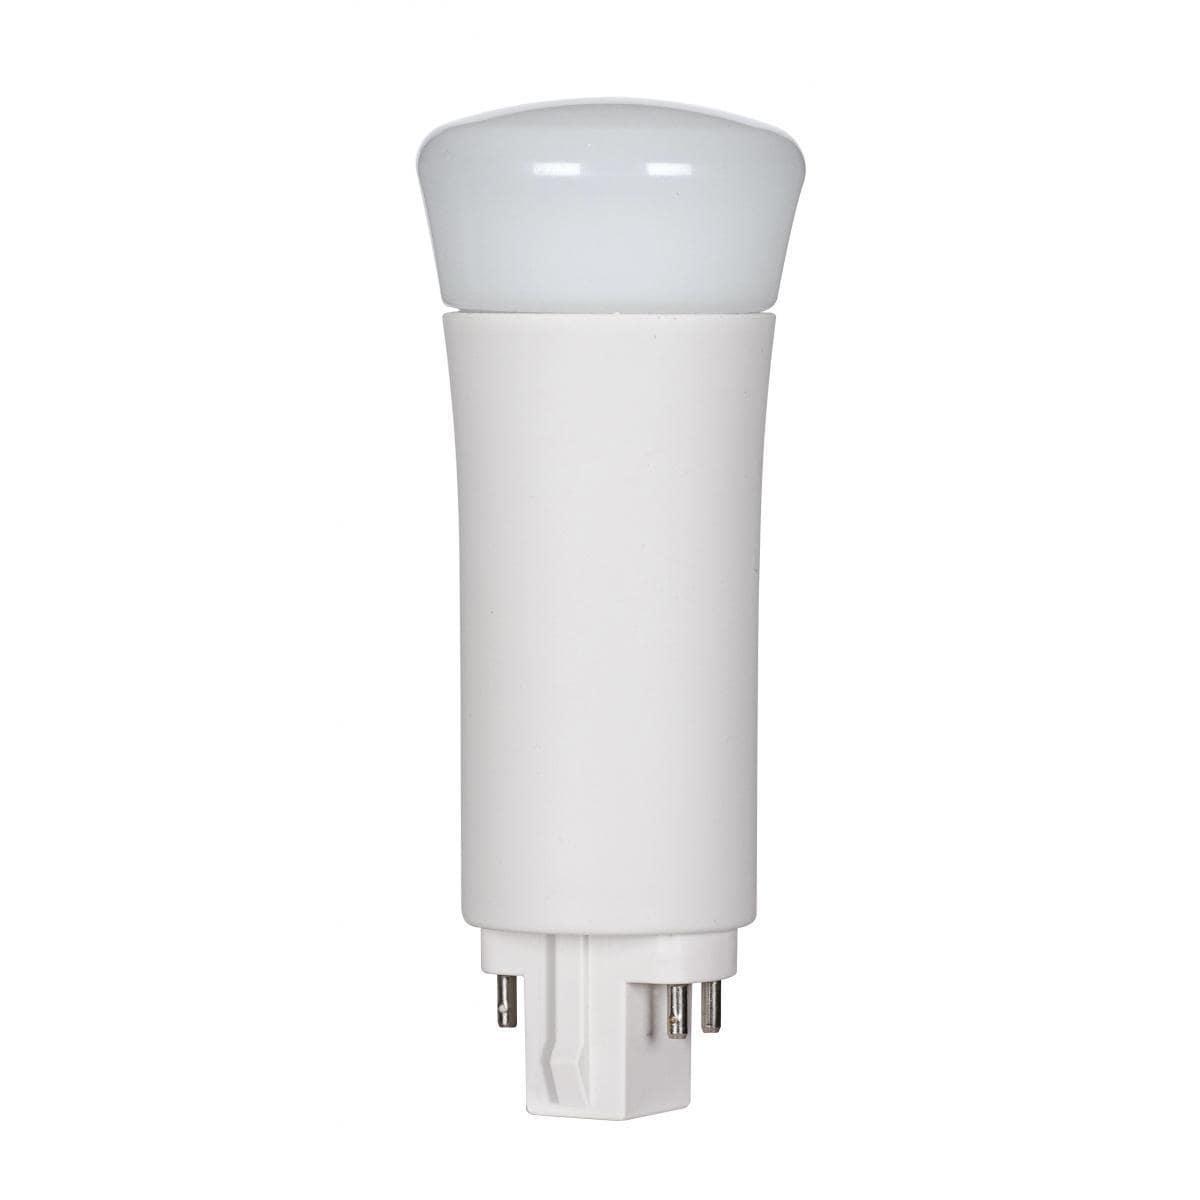 SATCO 9W LED PL 4-Pin - 3000K - G24q Base - 120 Deg Beam ...